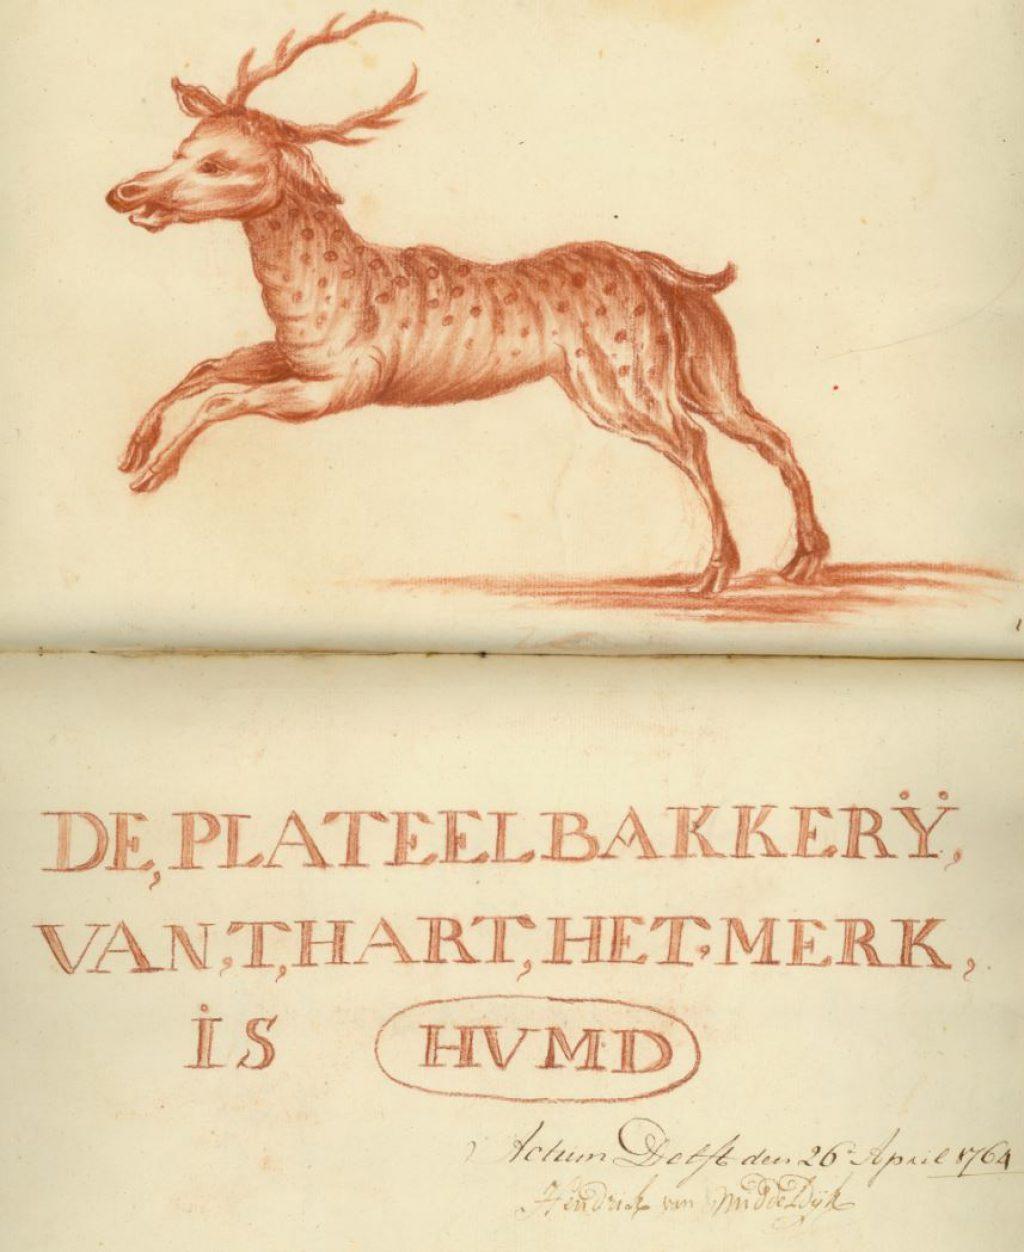 Merk van plateelbakkerij 't Hart, 1764. (Archief 1, inv.nr 1732; TMS 11570)